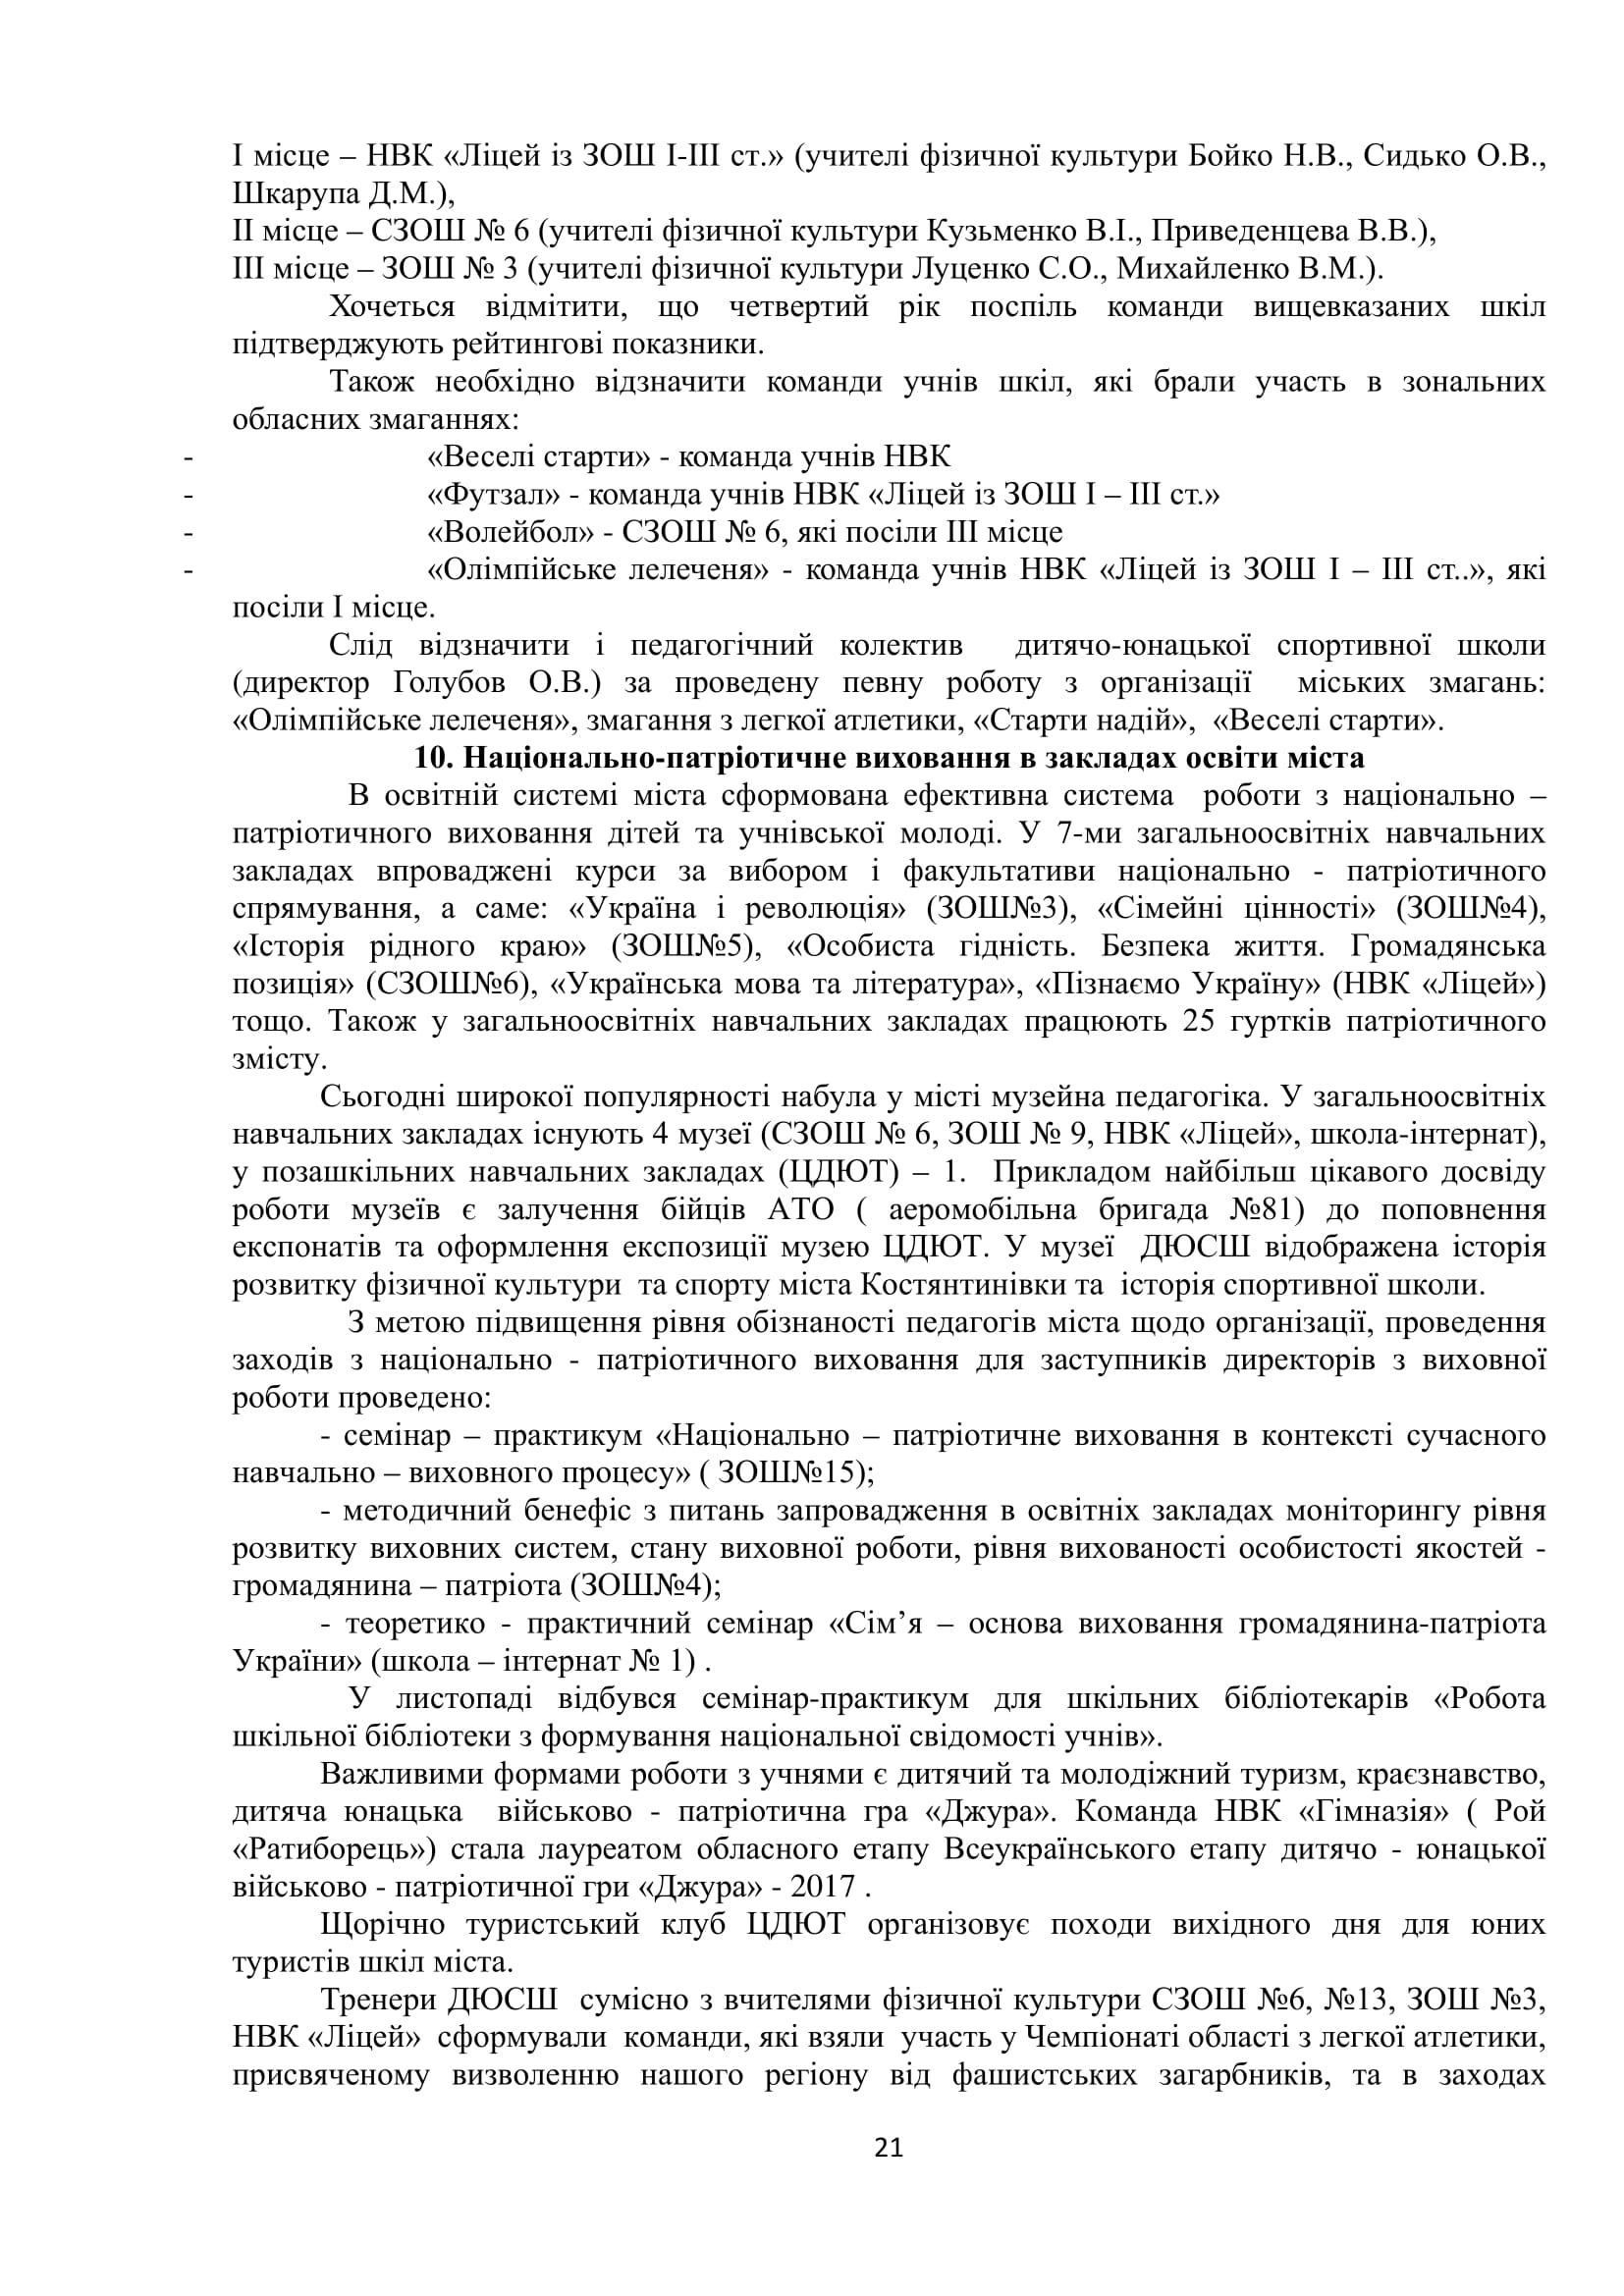 2017-2018 - ММК план роботи-22